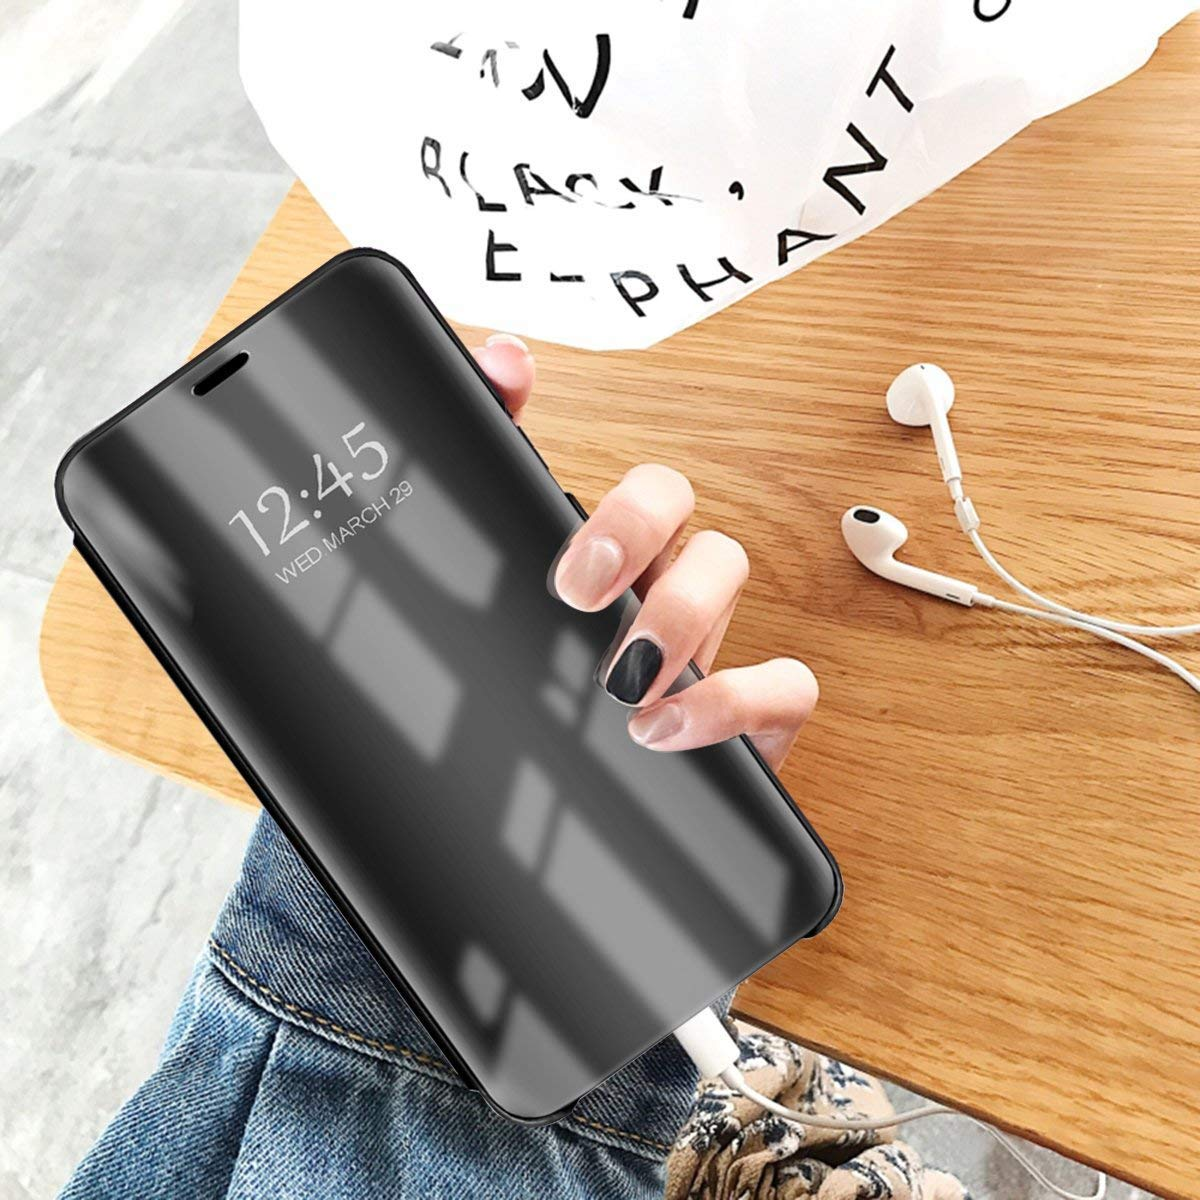 Caler H/ülle Kompatibel Samsung Galaxy A2 Core H/ülle Spiegel Cover Clear View Crystal Case Schutzh/ülle Mirror handyh/ülle handyhuelle etui huelle Flip metallic Frau schal mit Tasche Ledertasche